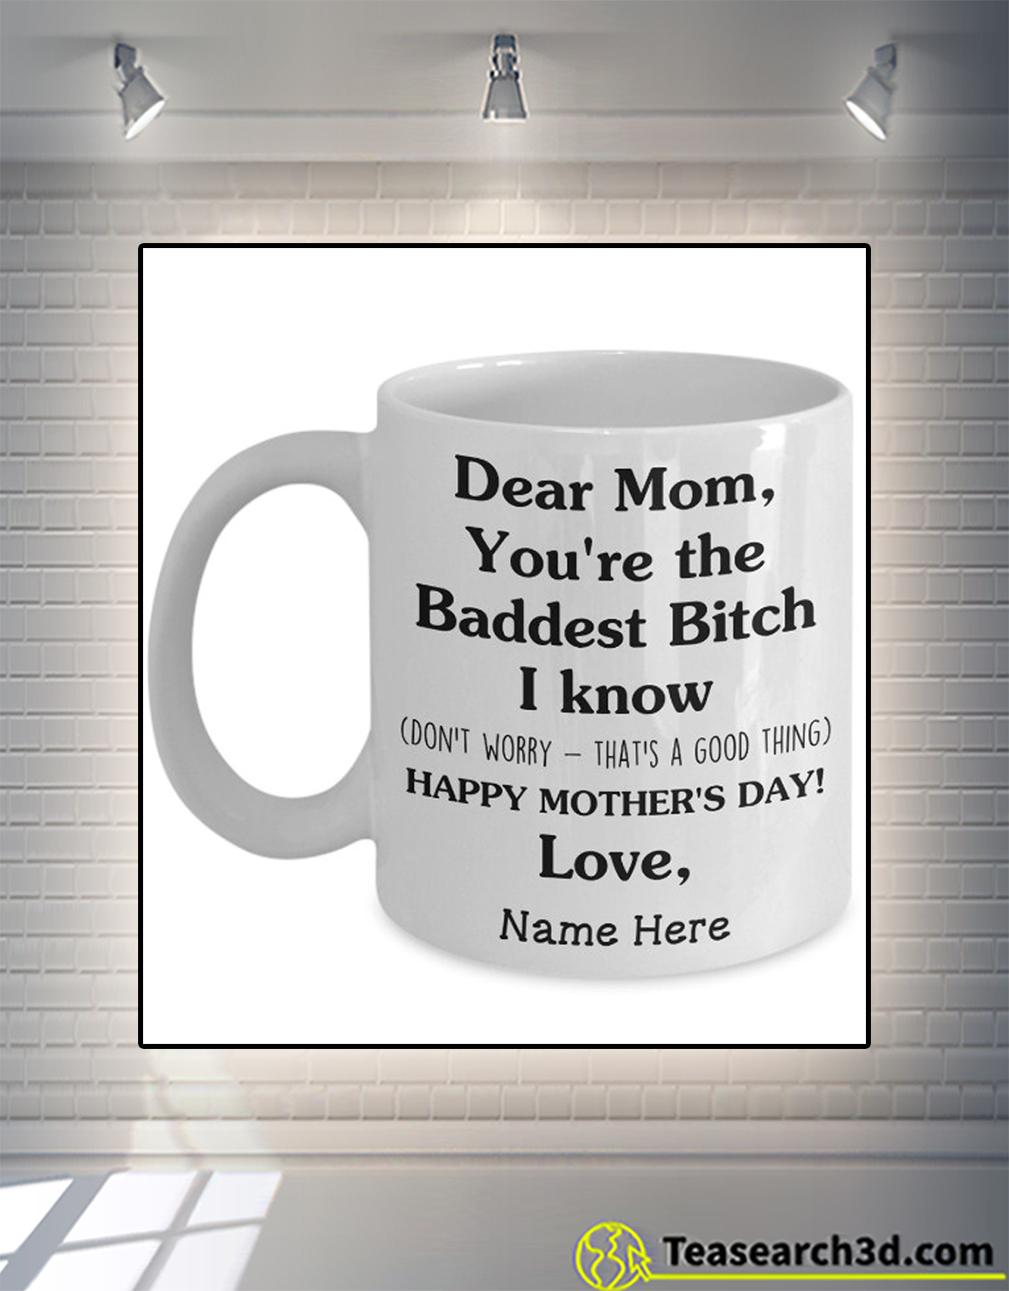 Personalized custom name dear mom you're the baddest bitch I know mug